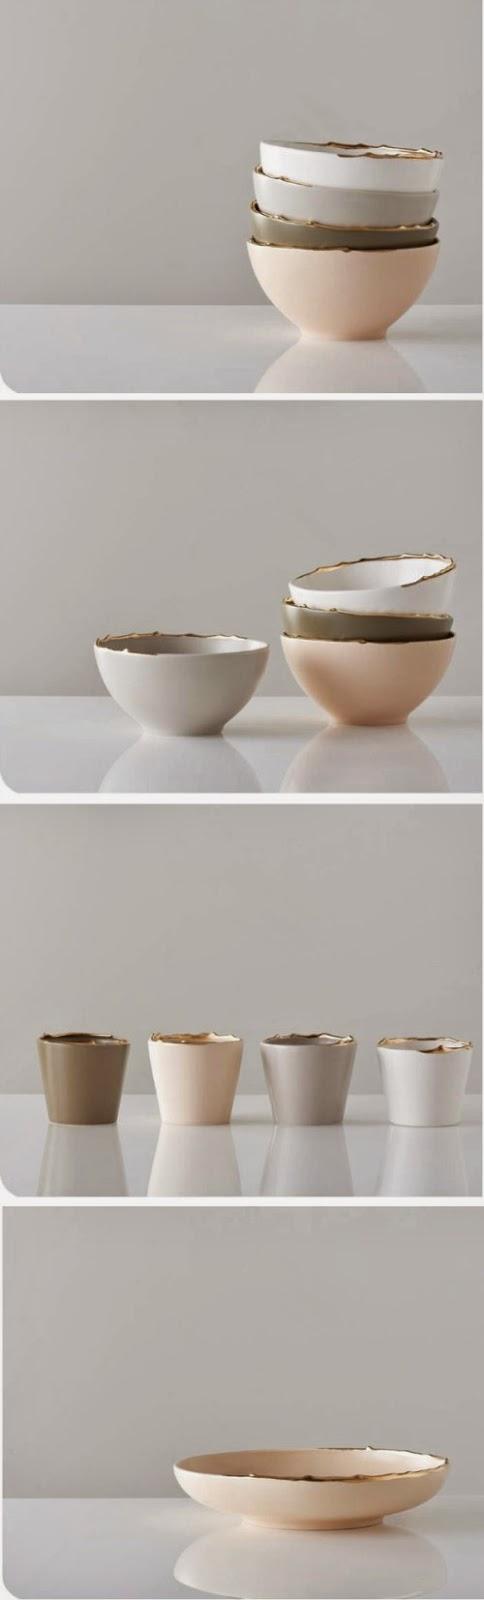 studiomake ceramics